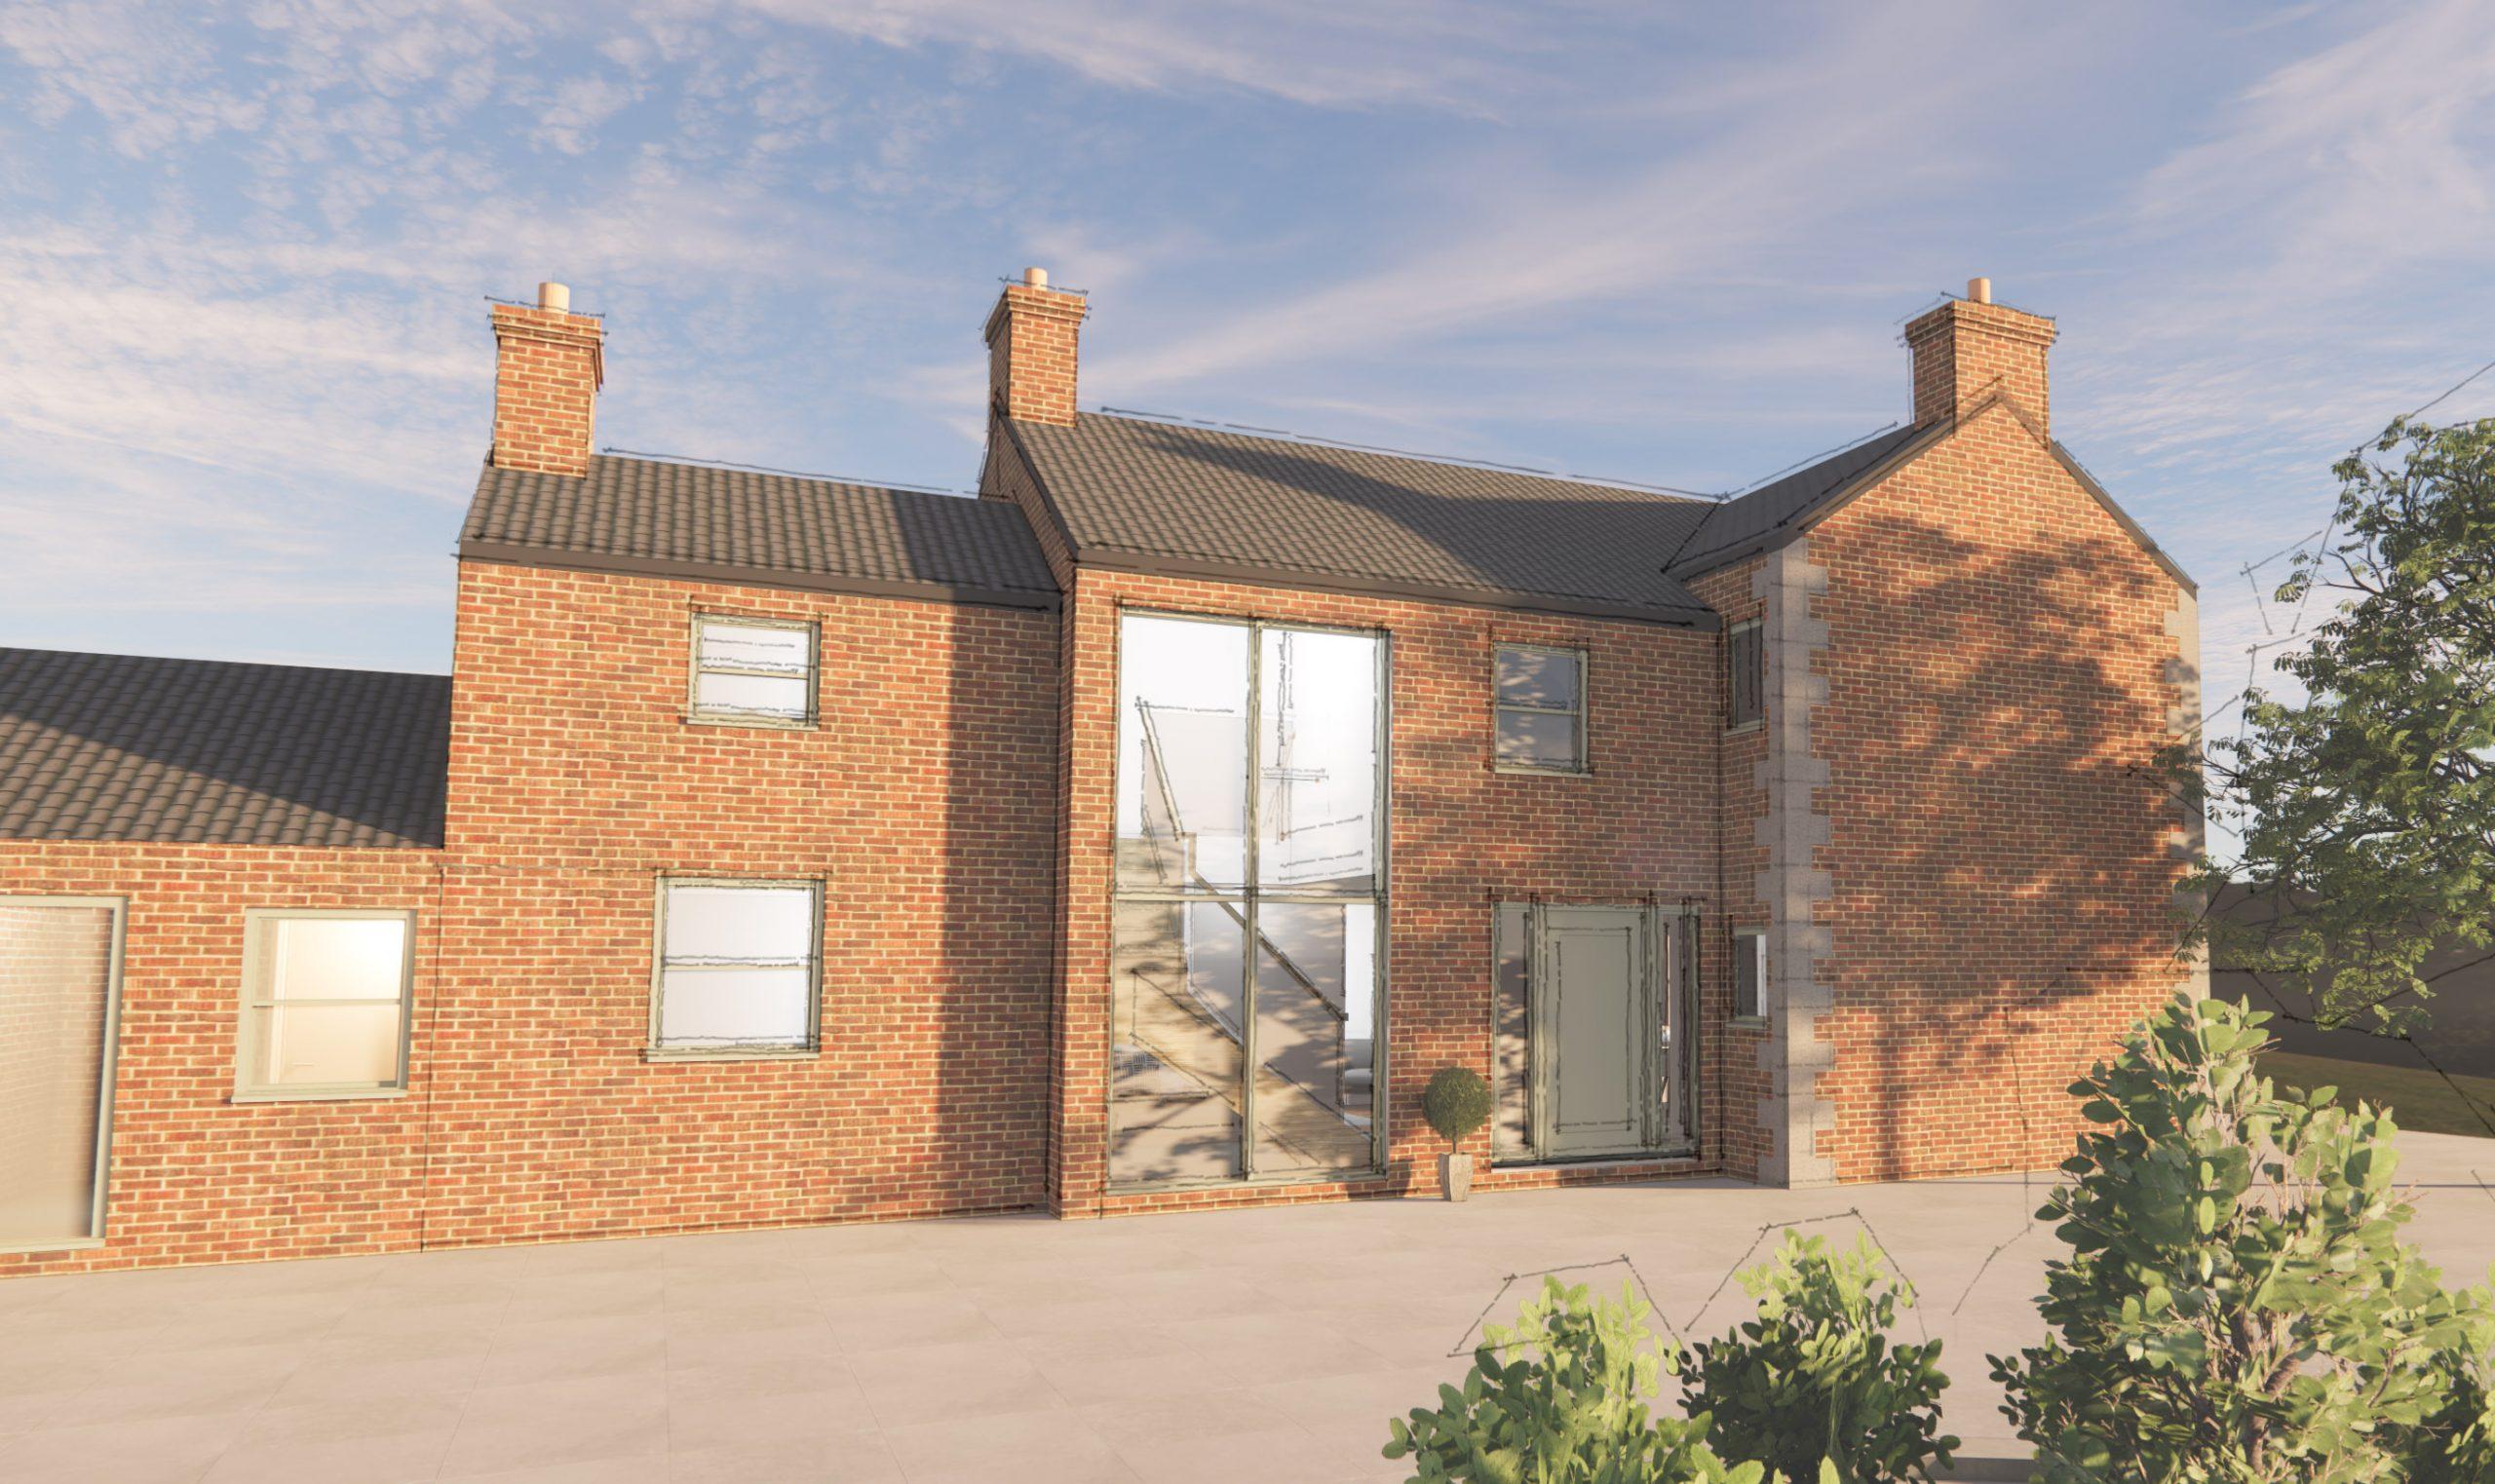 Farmhouse remodel, barn remodel, derbyshire architect